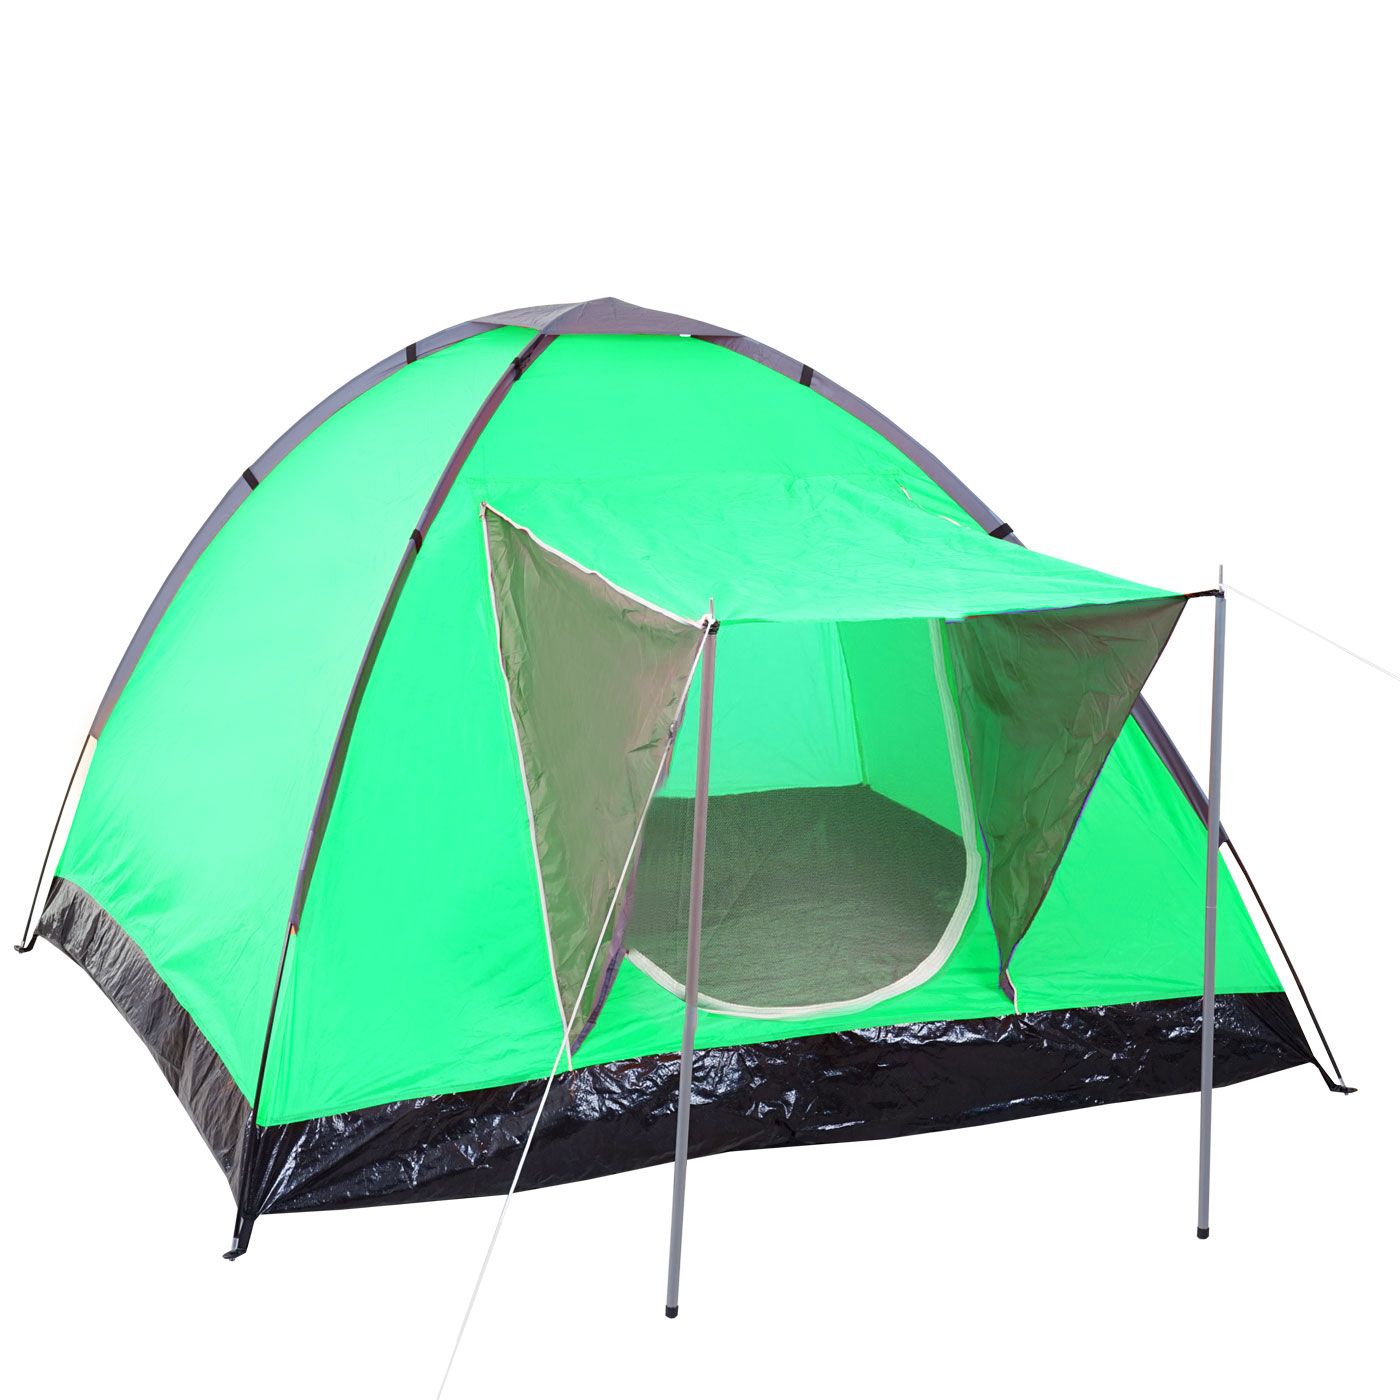 Zelt Für Zwei Personen Leicht : Campingzelt loksa mann zelt kuppelzelt igluzelt